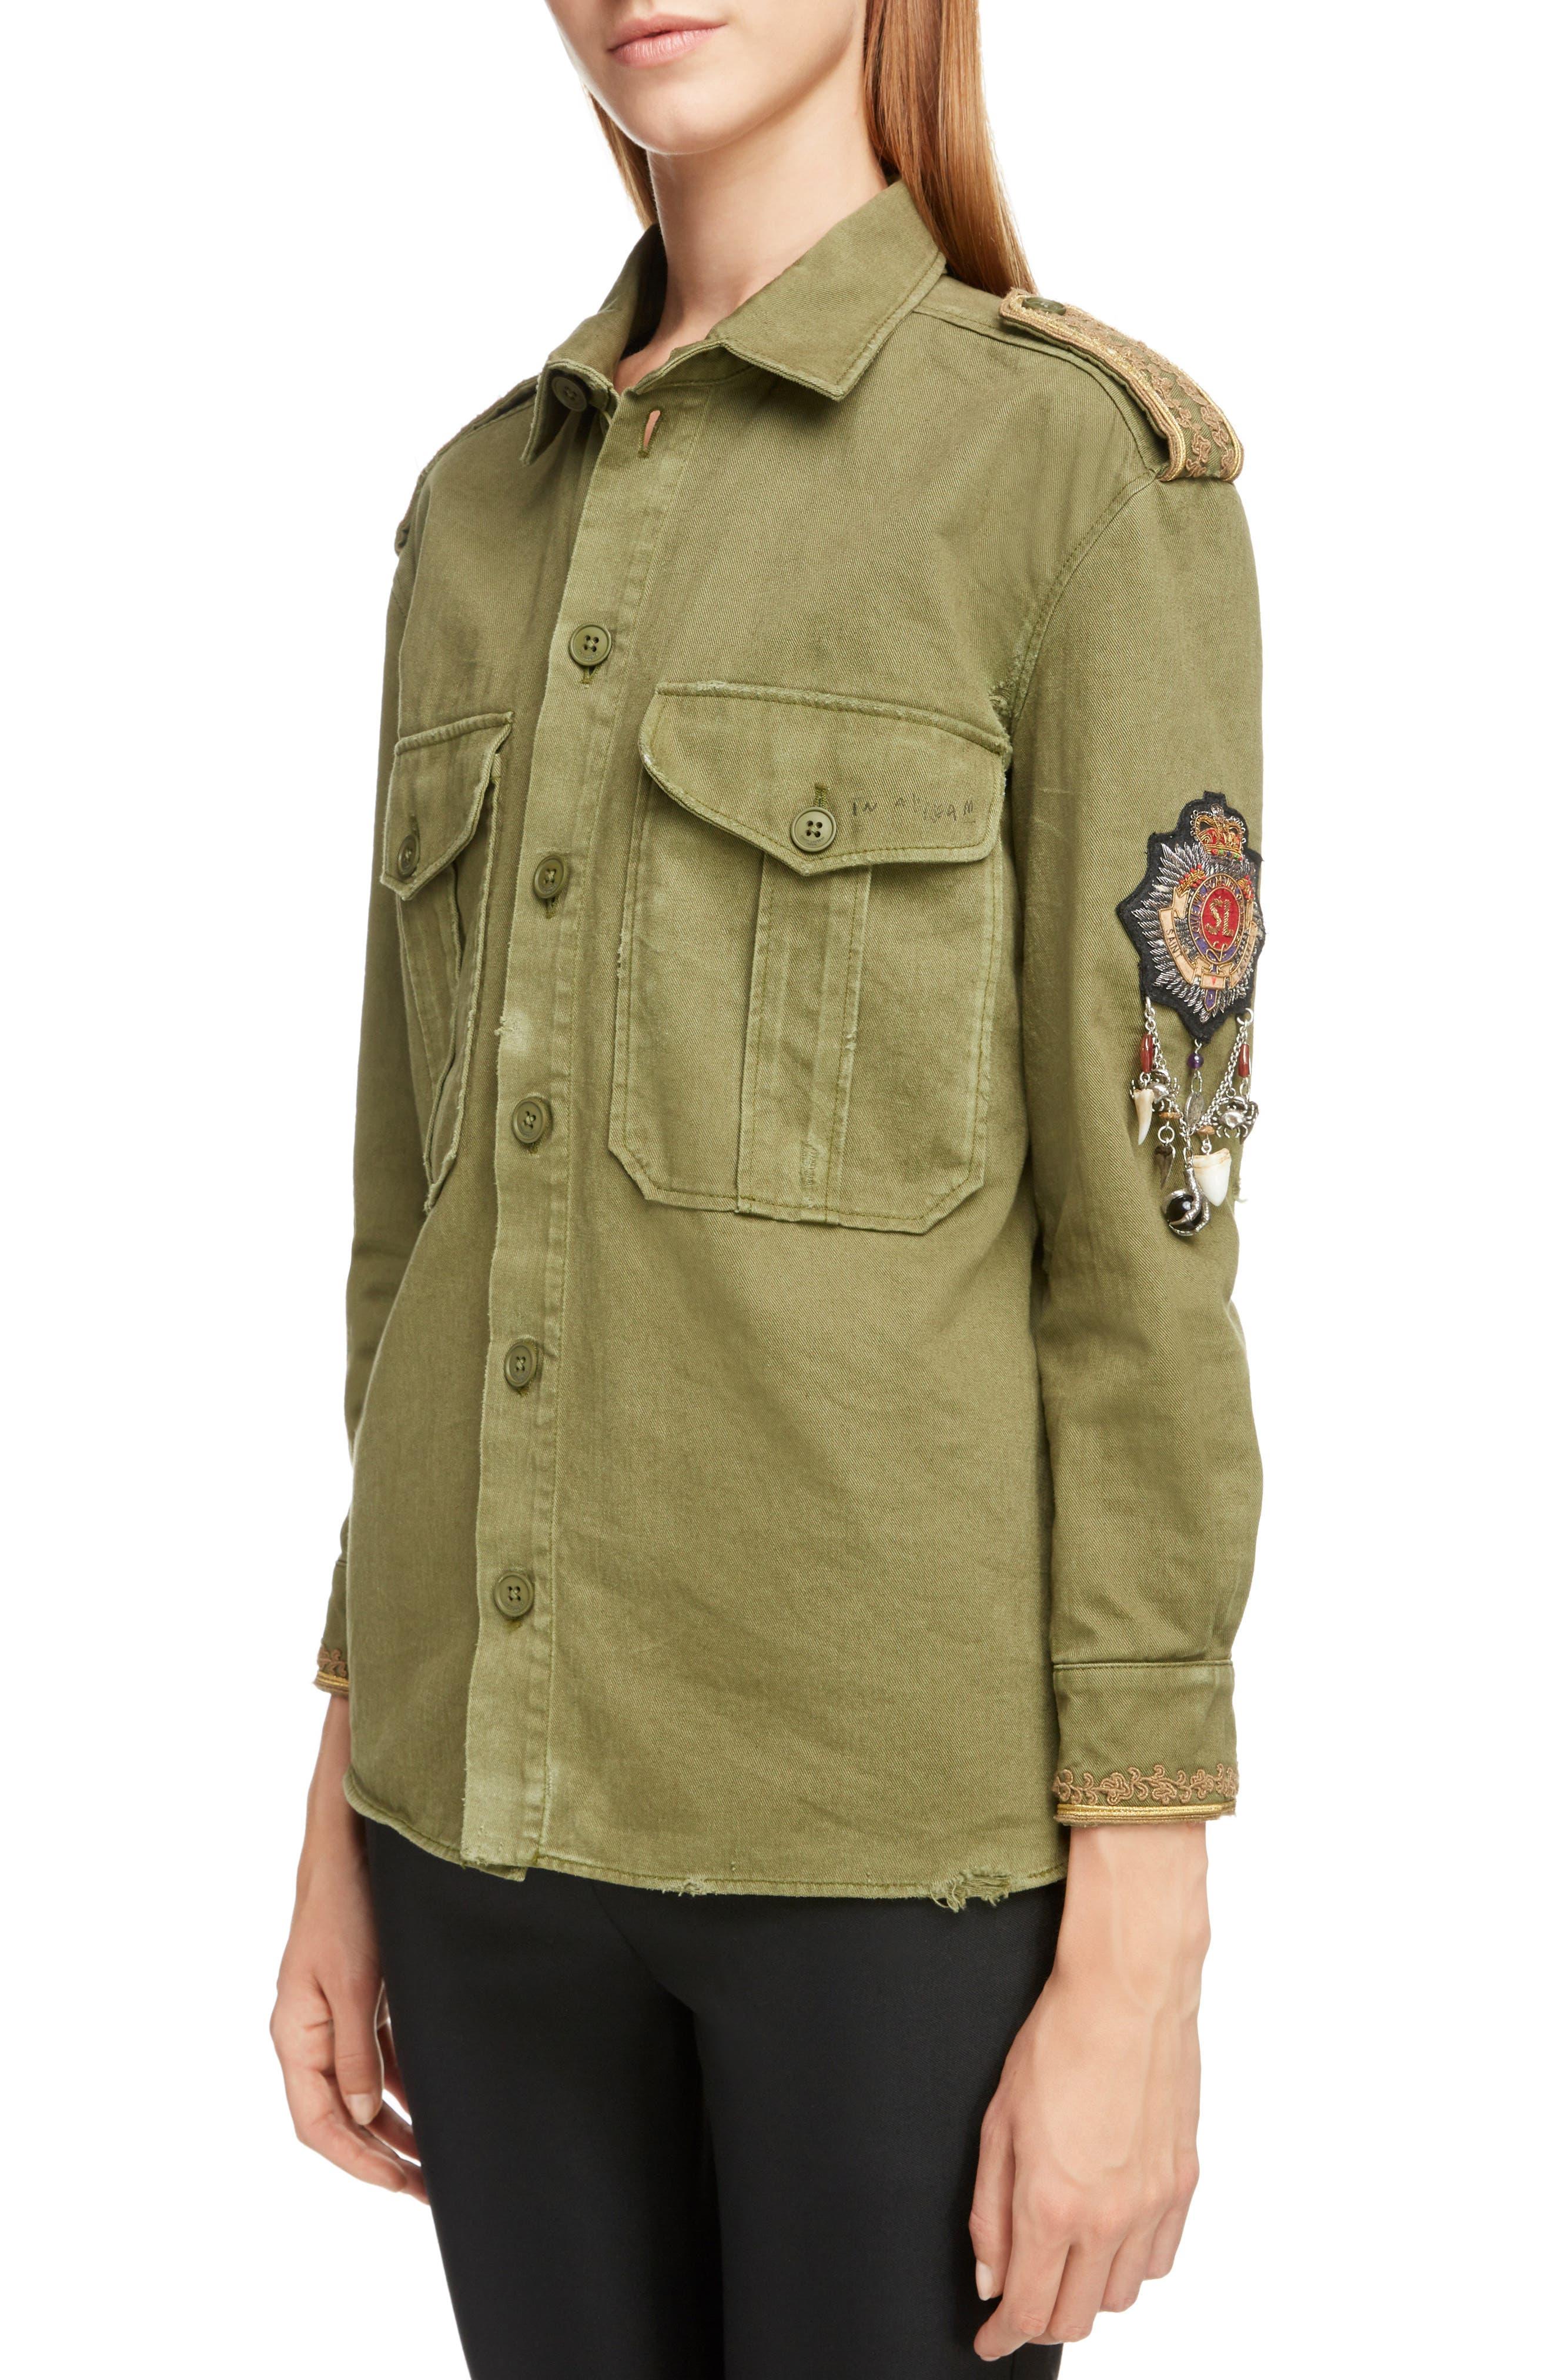 SAINT LAURENT,                             Military Logo Charm Shirt,                             Alternate thumbnail 4, color,                             OLIVE